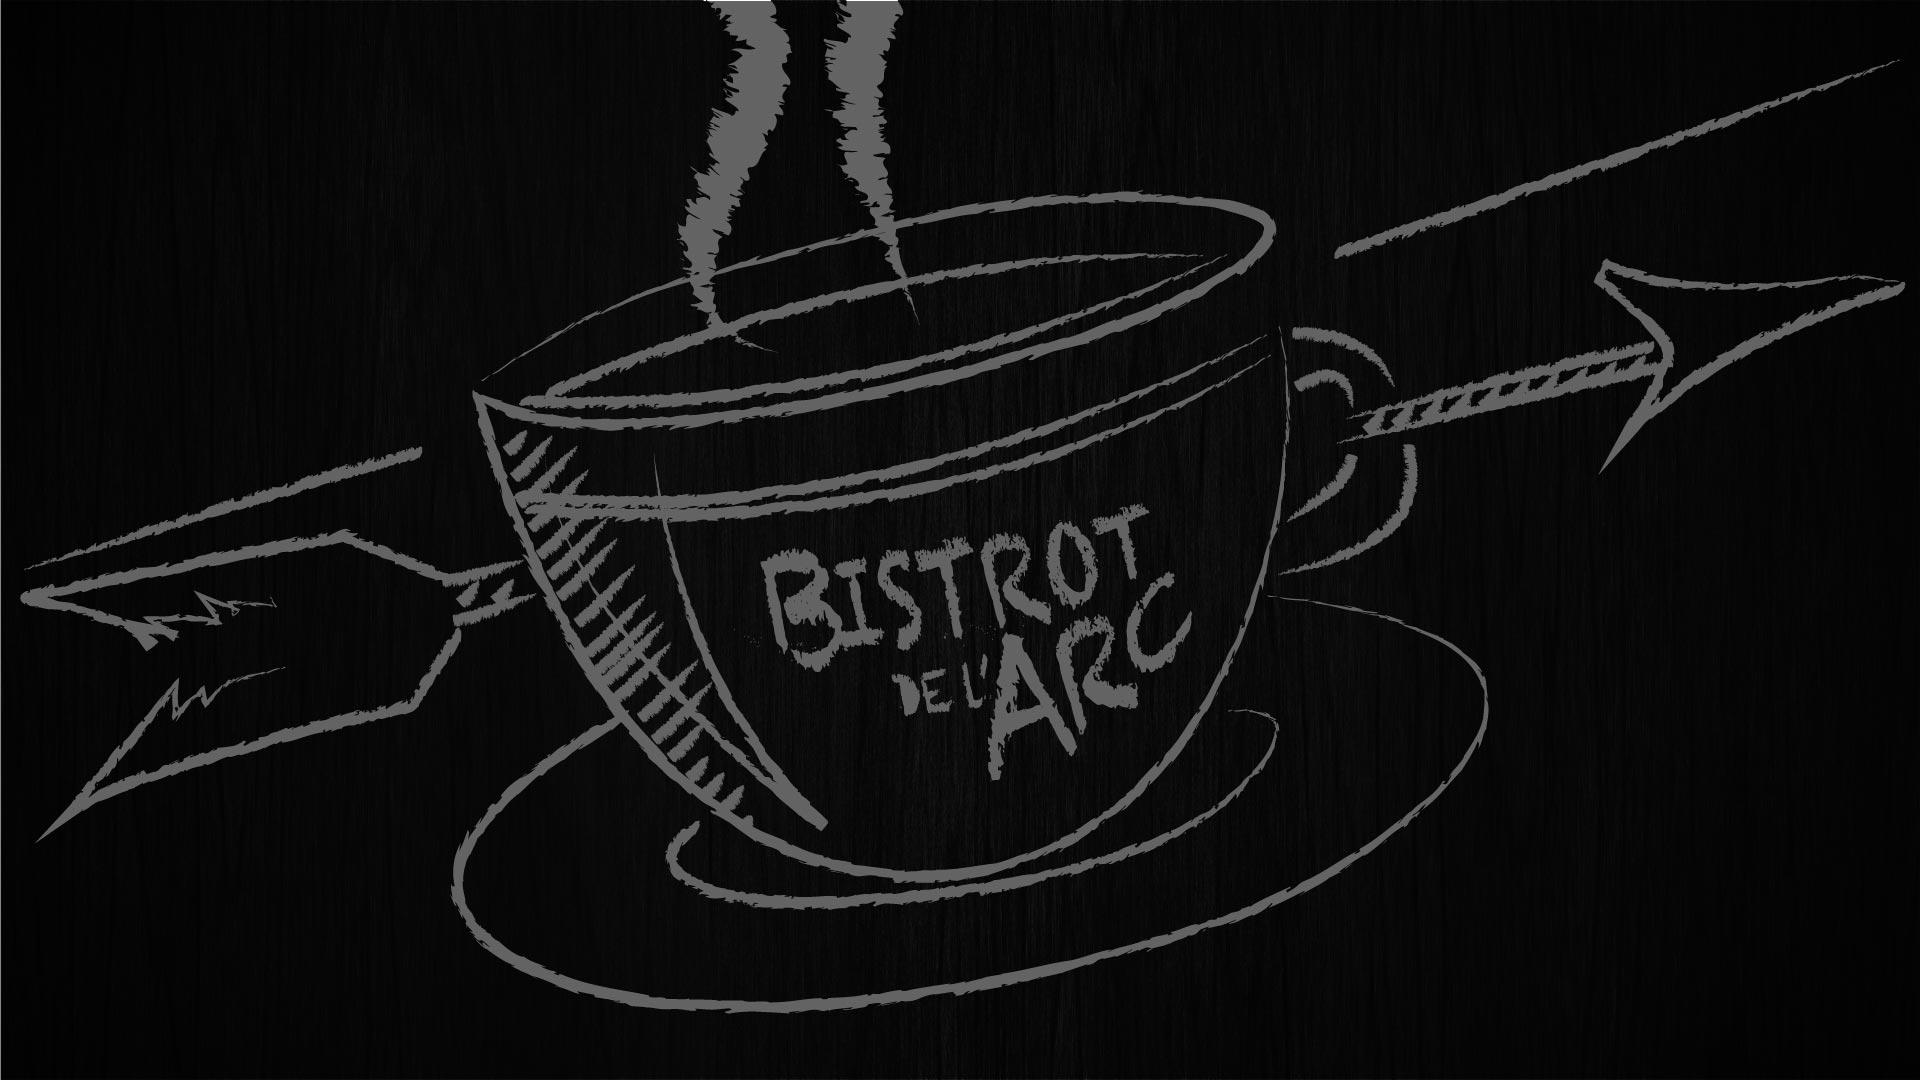 bistrotdelarc-dejeuner-cafe-mulhouse